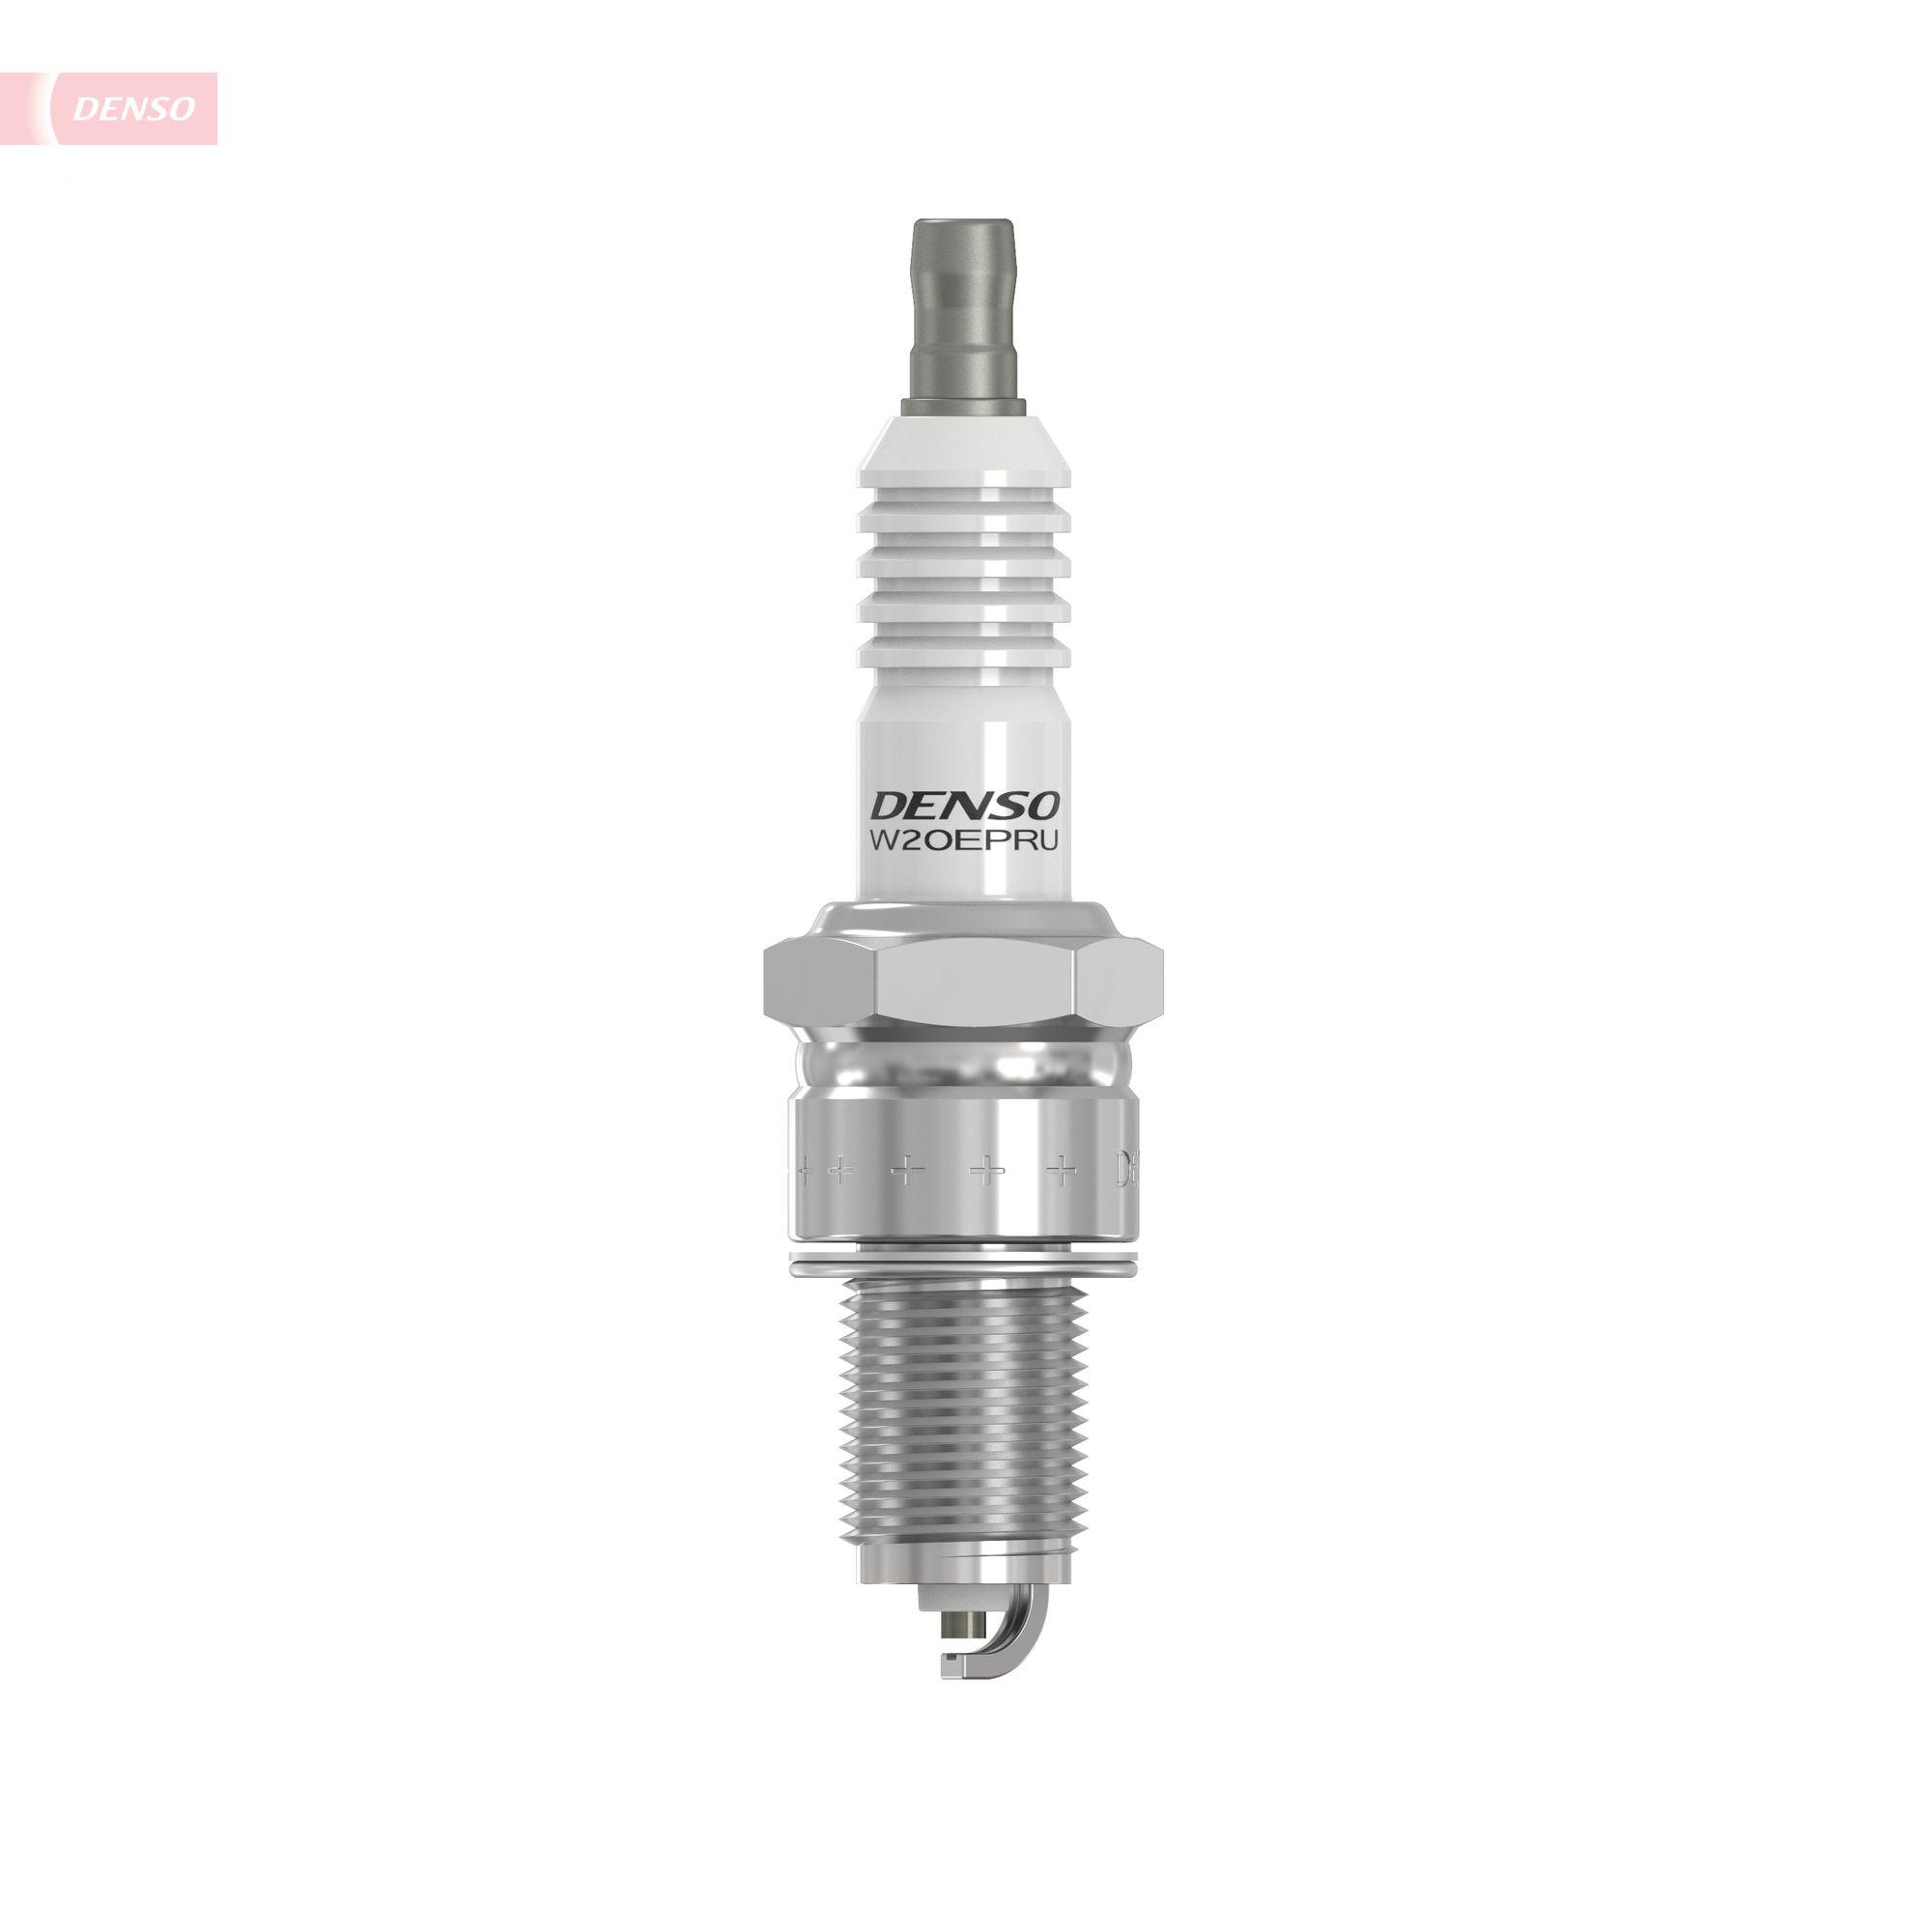 DENSO: Original Zündkerzensatz W20EPR-U ()